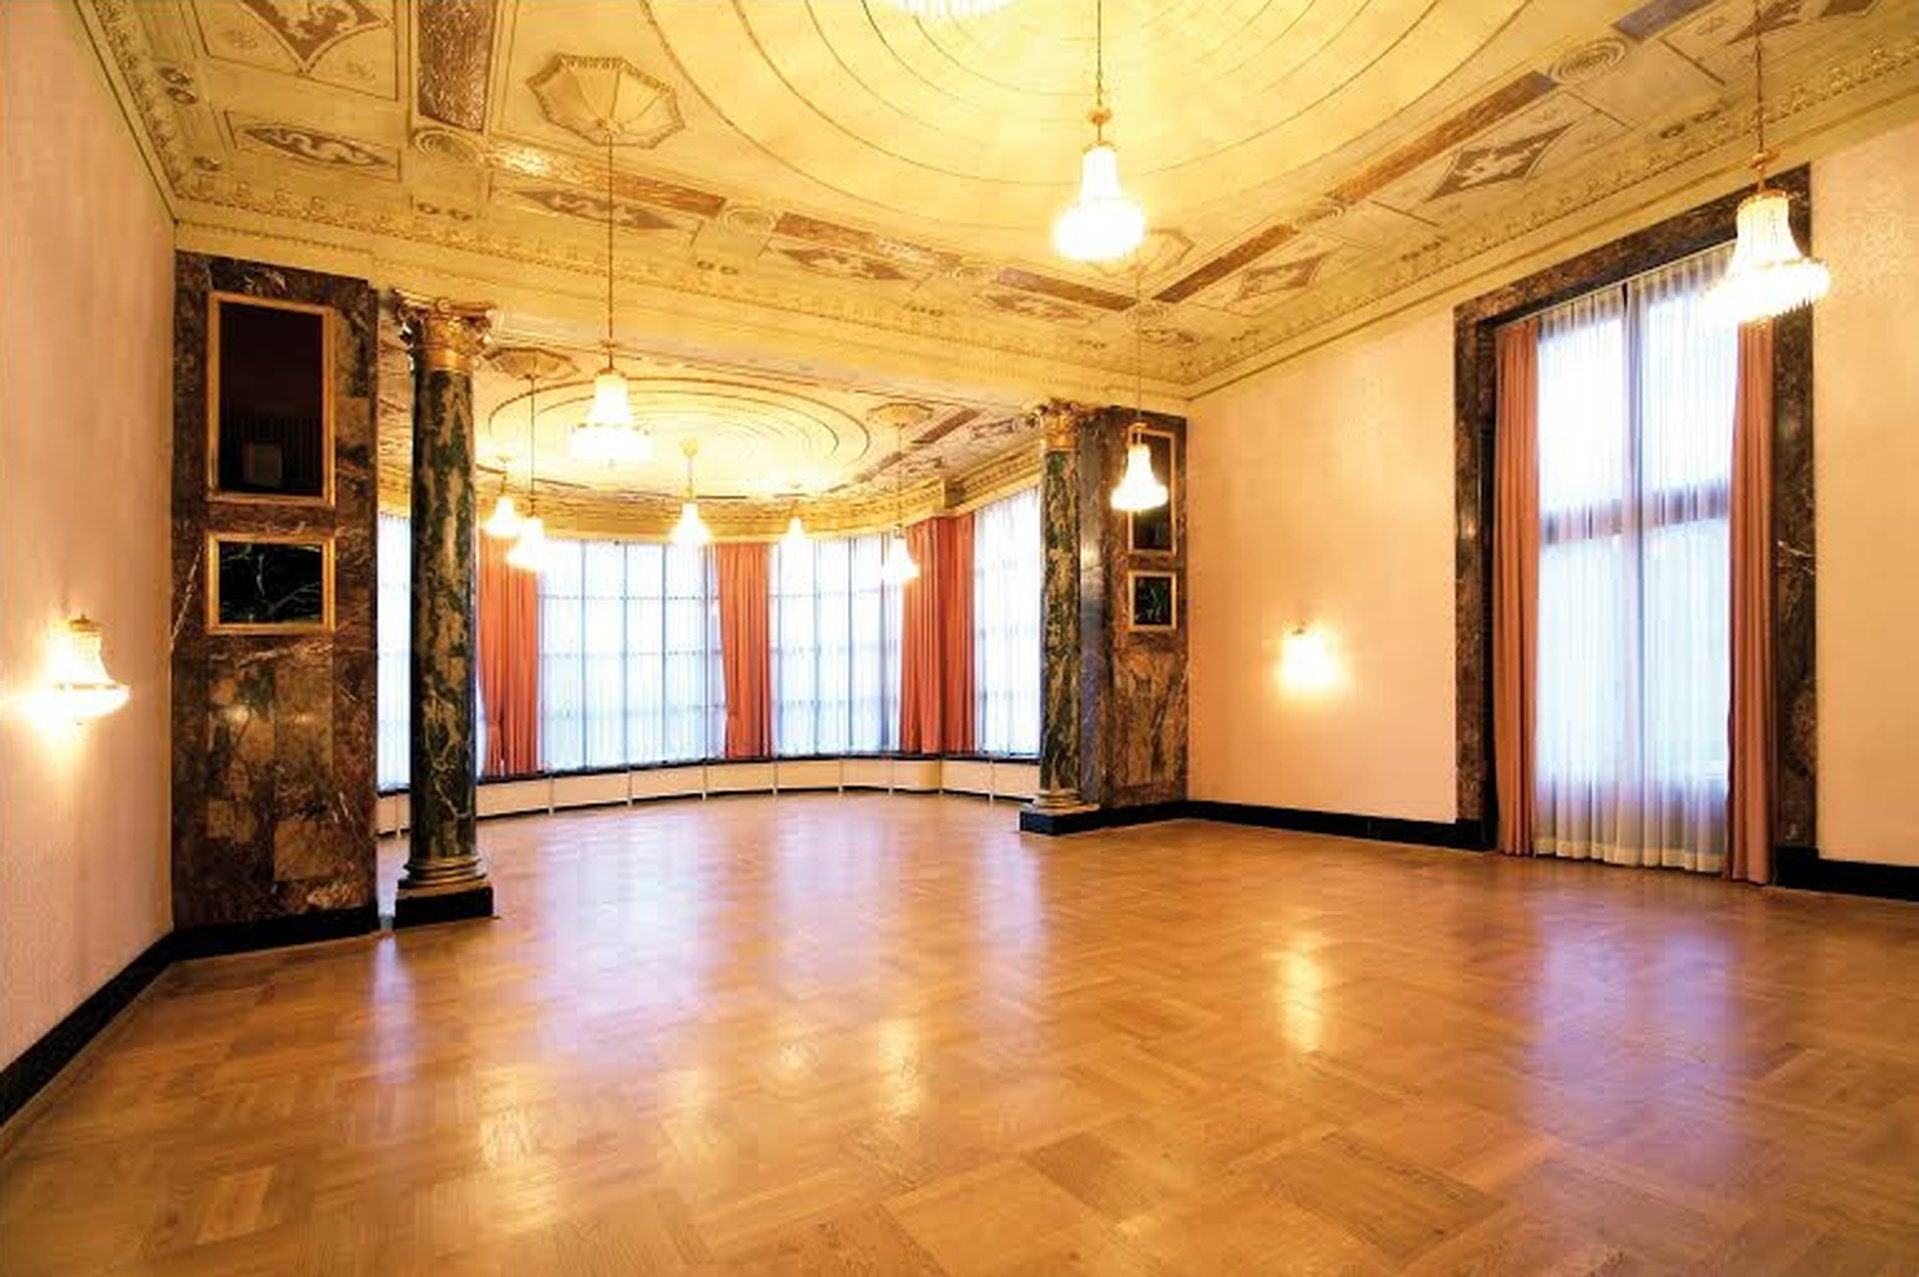 Frankfurt corporate event venues Historic venue Kurhaus - Salon Carl Schuricht image 0